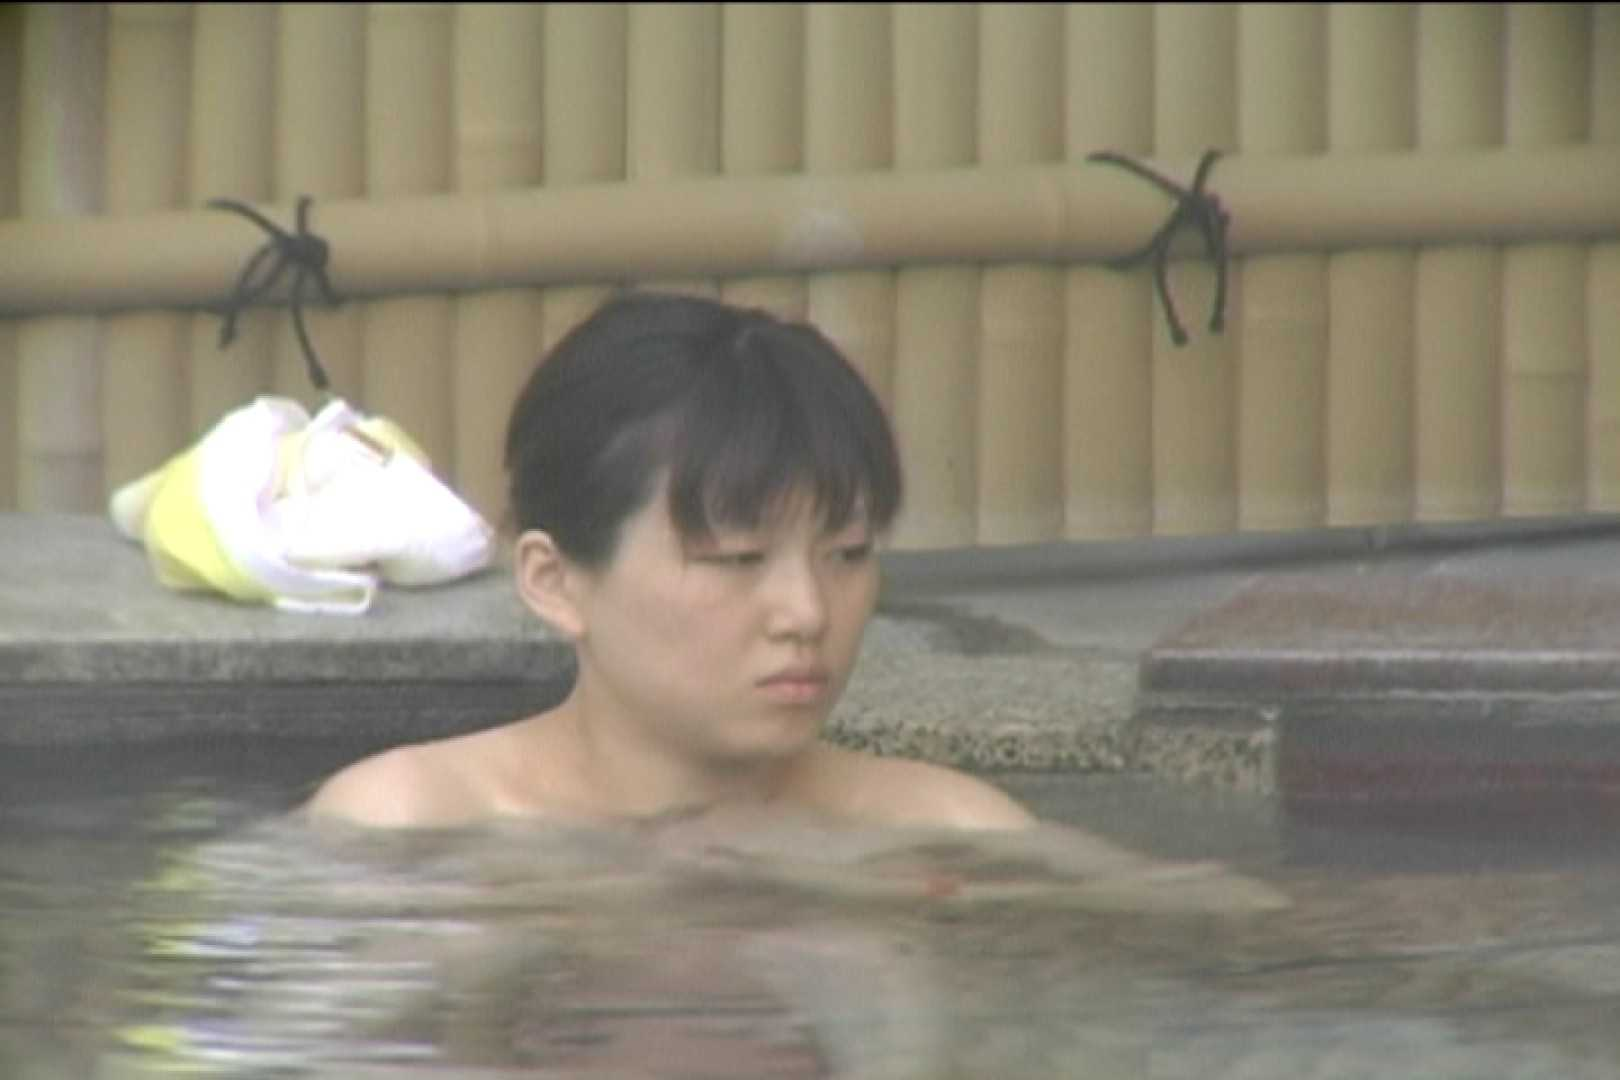 Aquaな露天風呂Vol.121 露天風呂編   盗撮シリーズ  82PIX 15